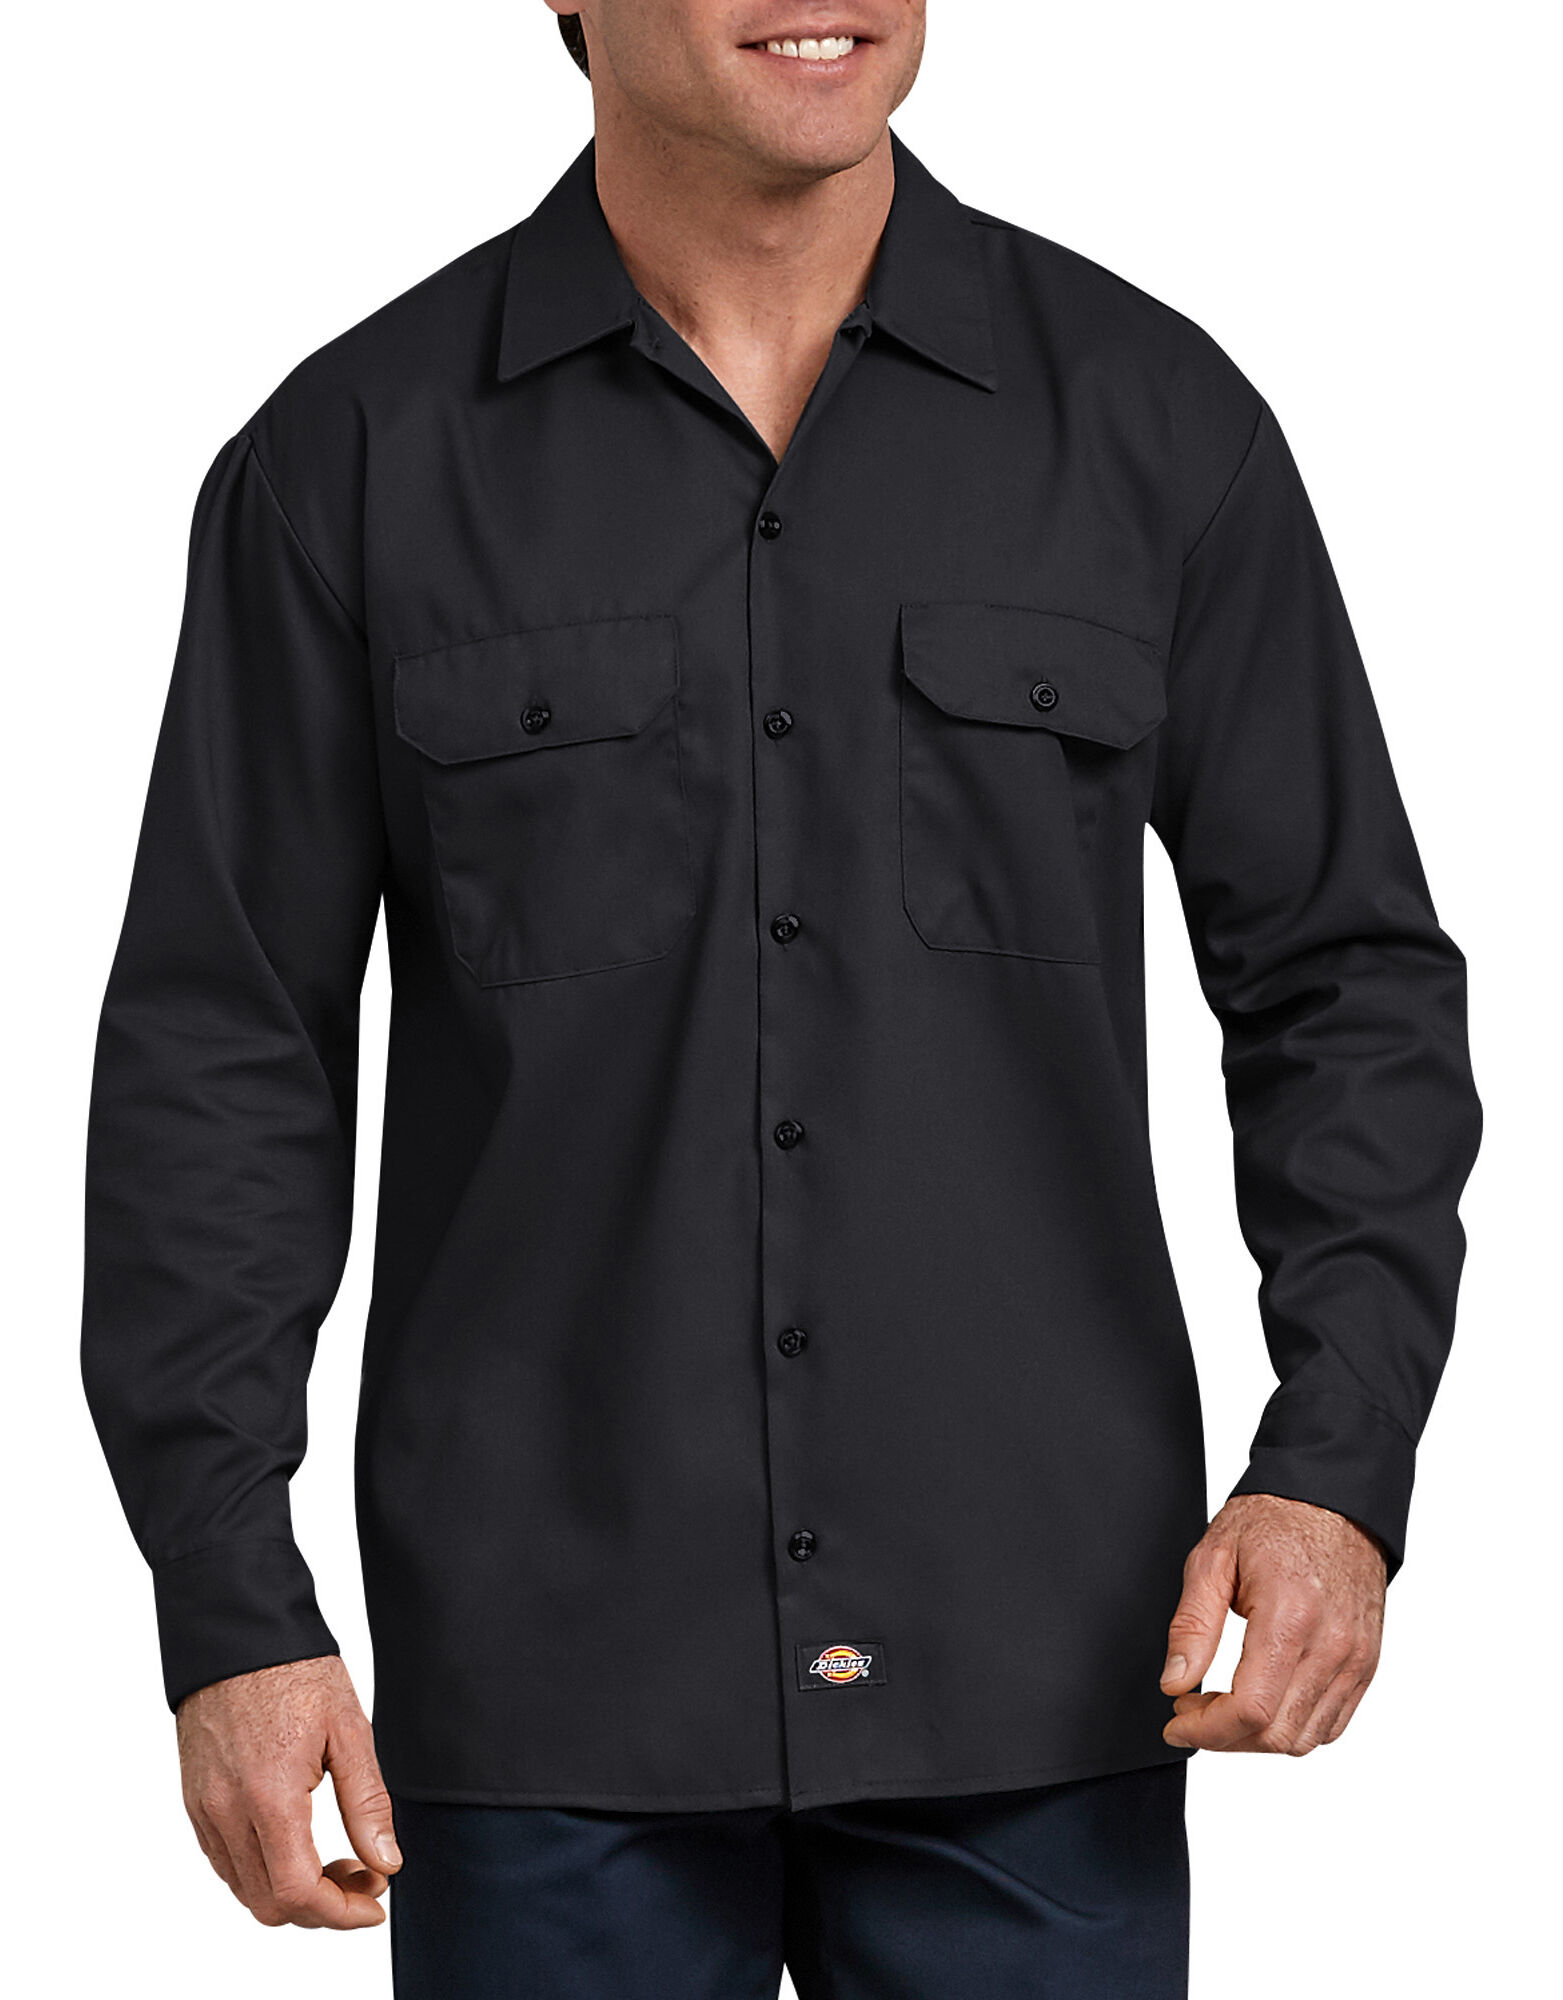 Flex relaxed fit long sleeve twill work shirt dickies for Black long sleeve work shirt